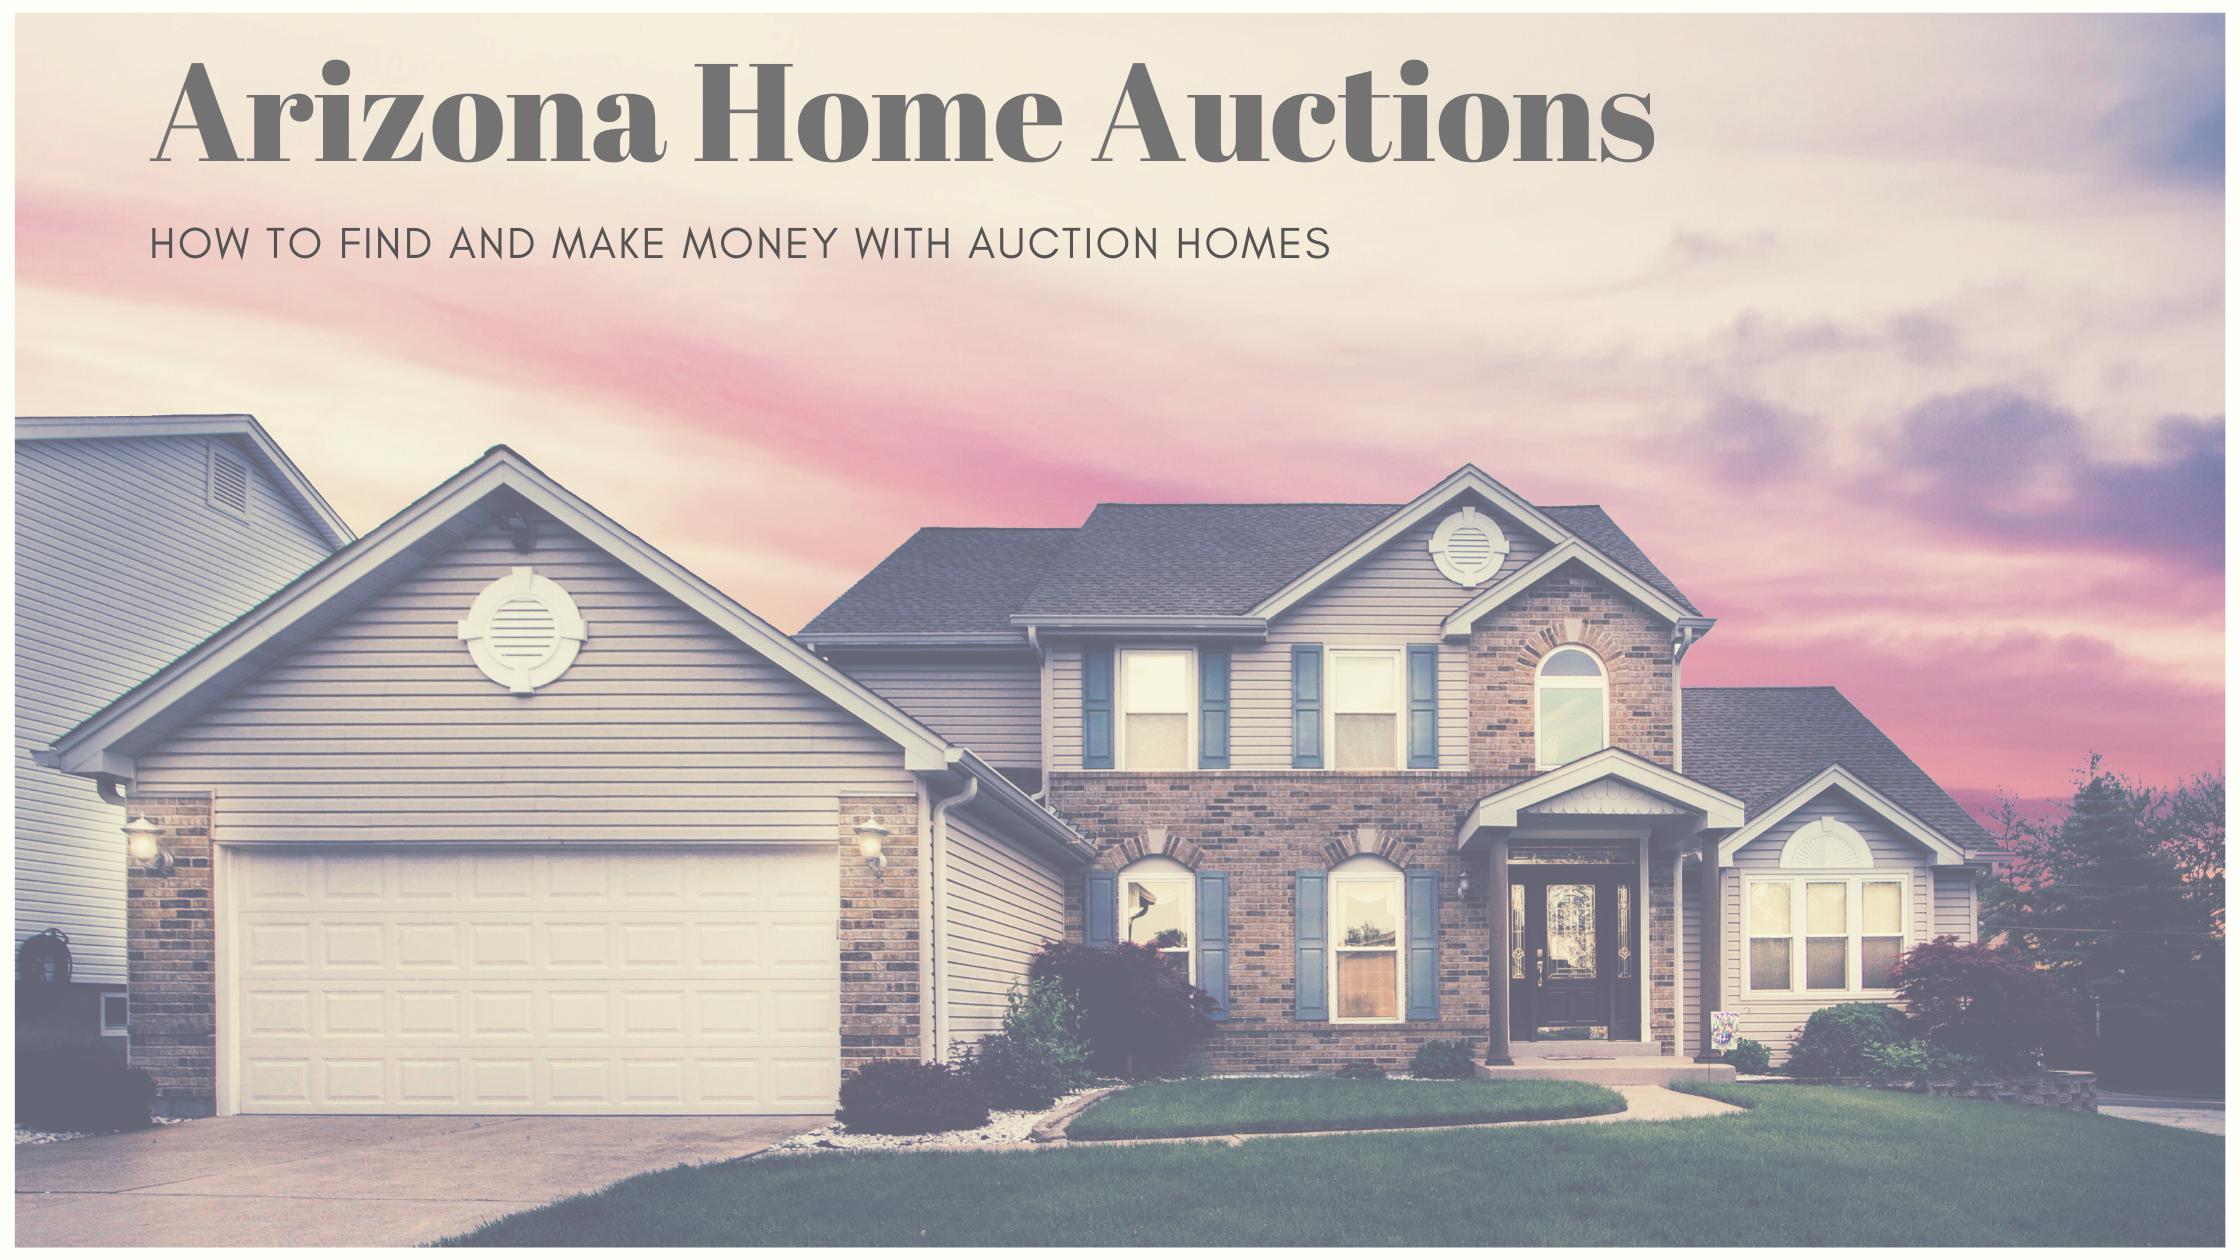 Arizona Home Auctions